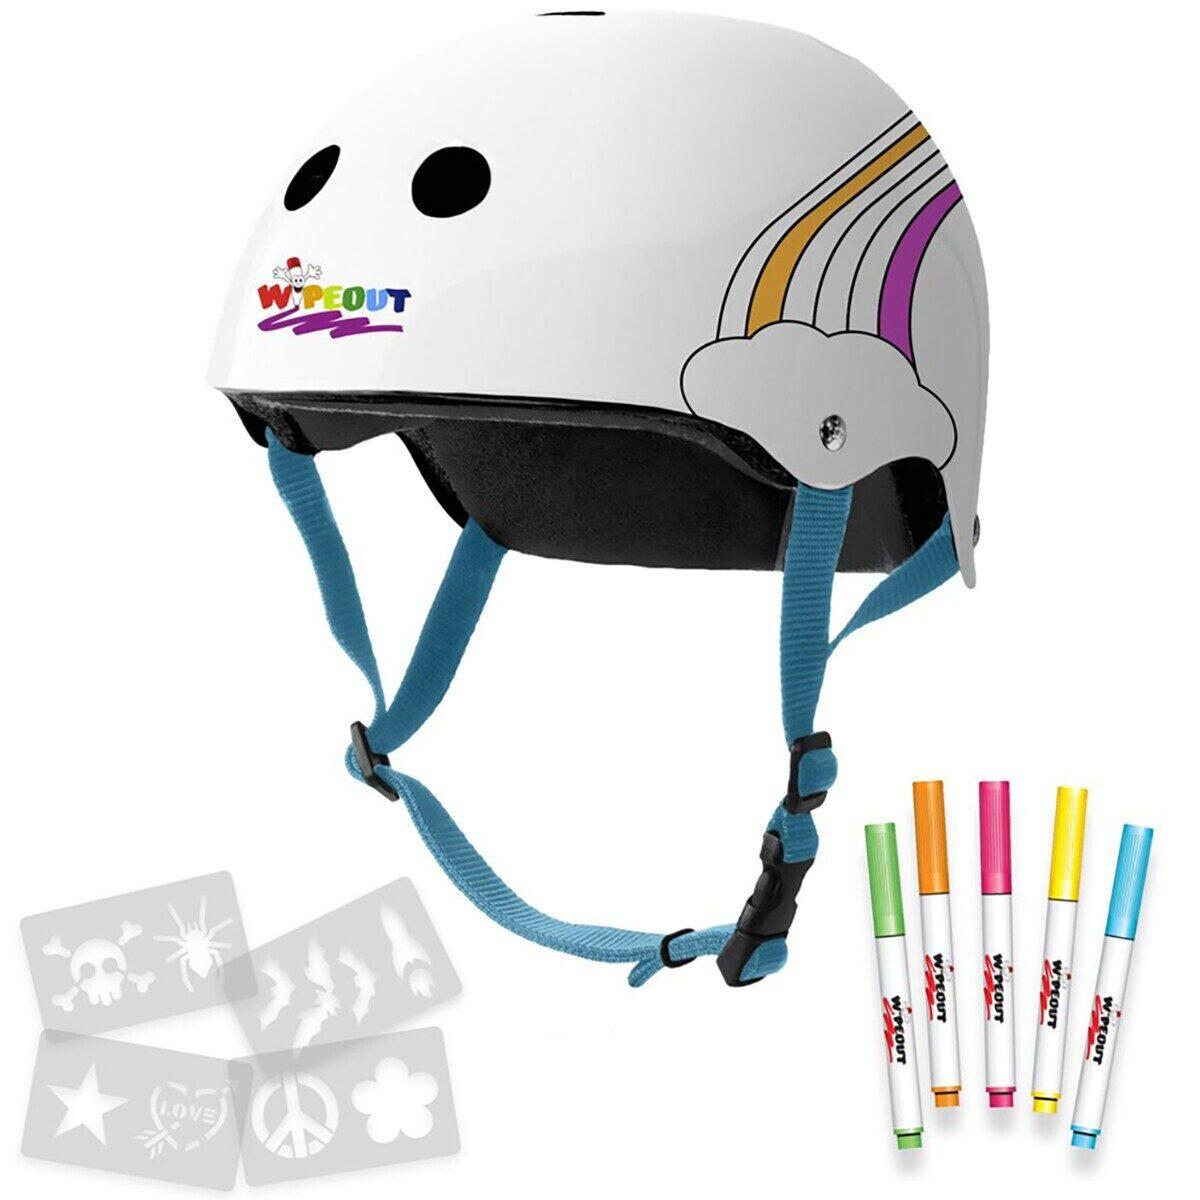 Купить White Rainbow (M 5+) - белый, Шлем Wipeout с фломастерами White Rainbow белый JL06F5389069 р. M 5+,